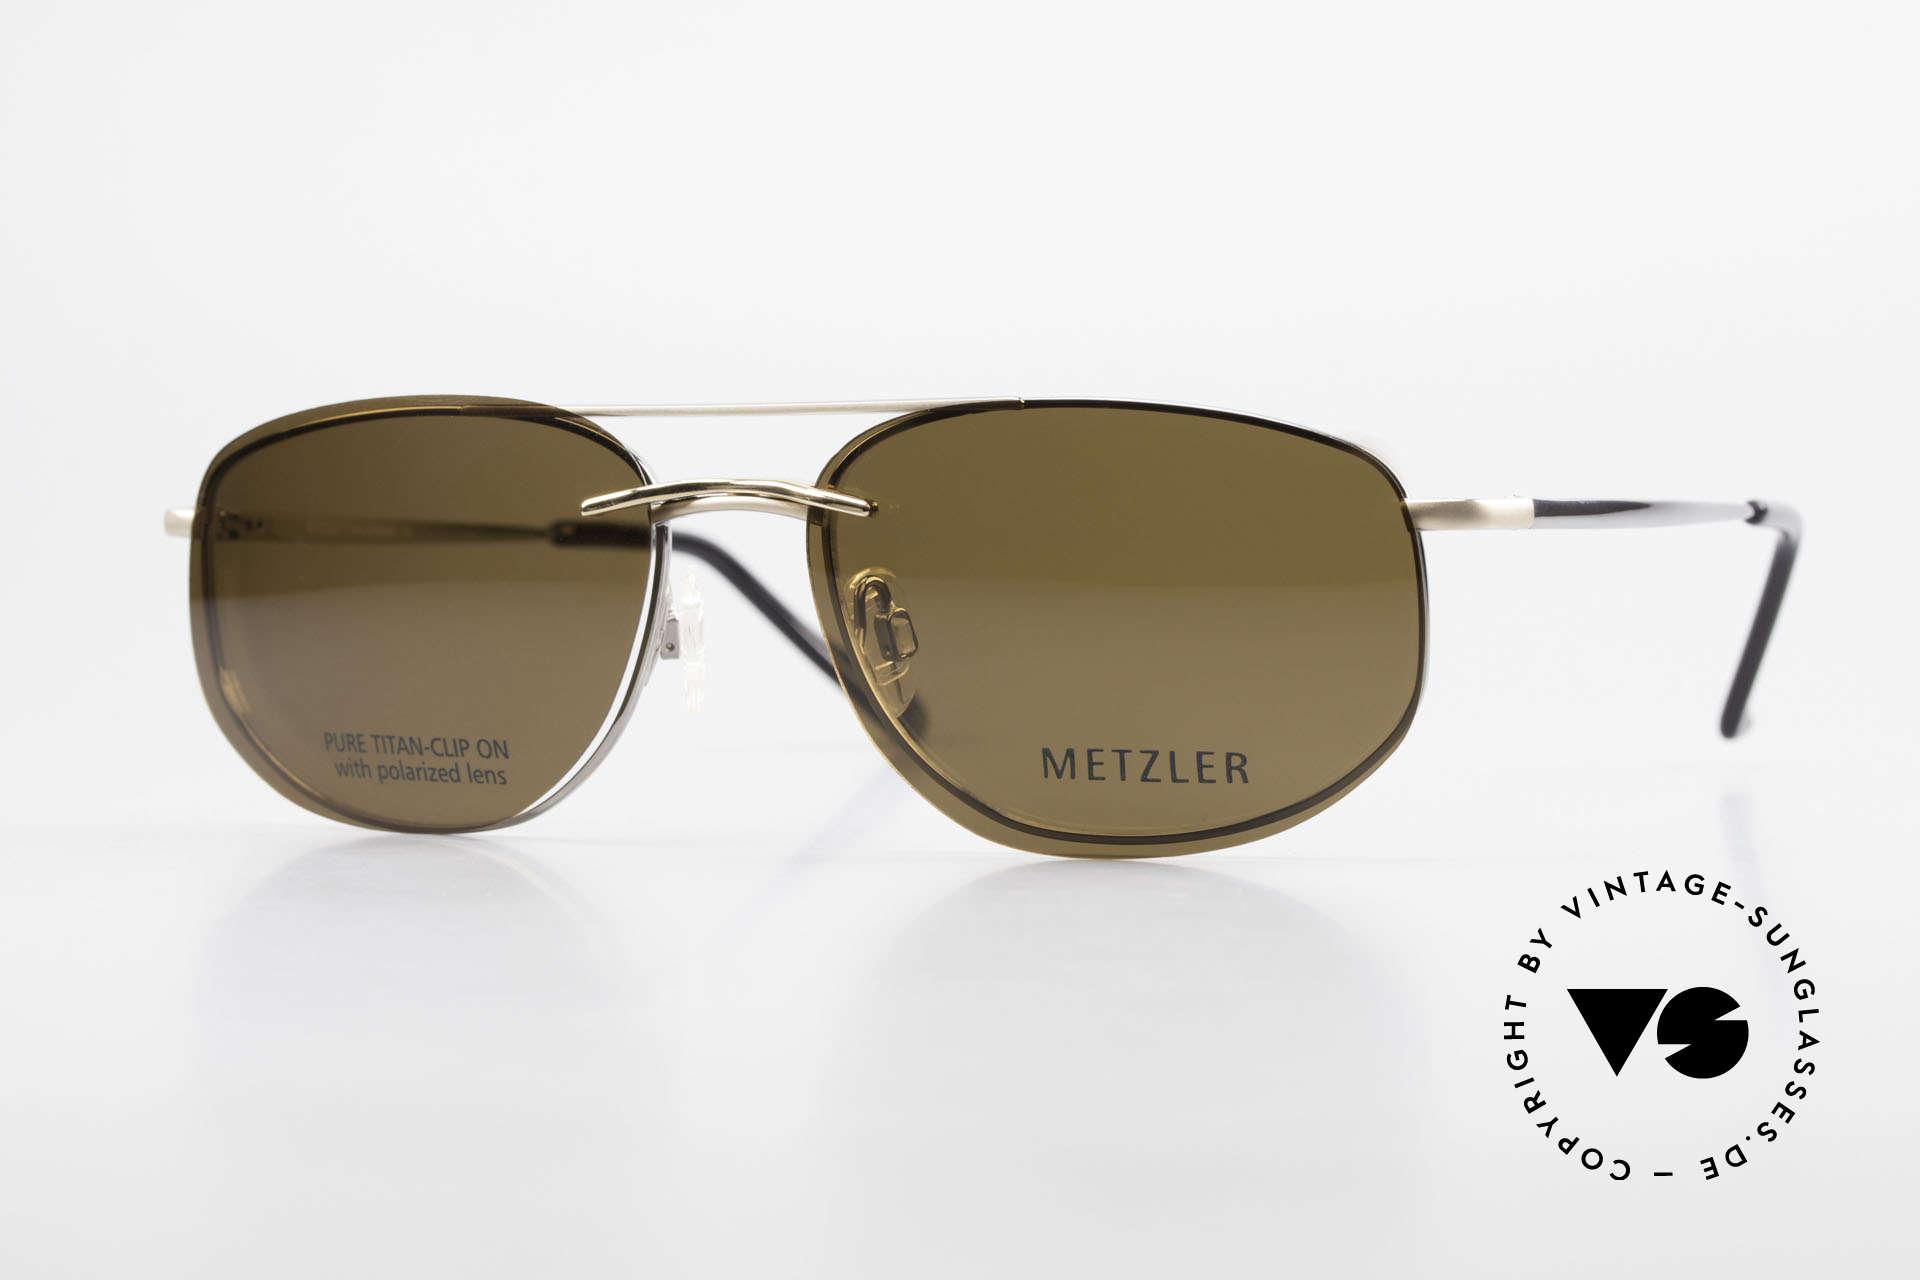 Metzler 1715 Titanium Specs Polarized Clip, Metzler 90's Titan glasses, 1715, col 023, 58/18, 140, Made for Men